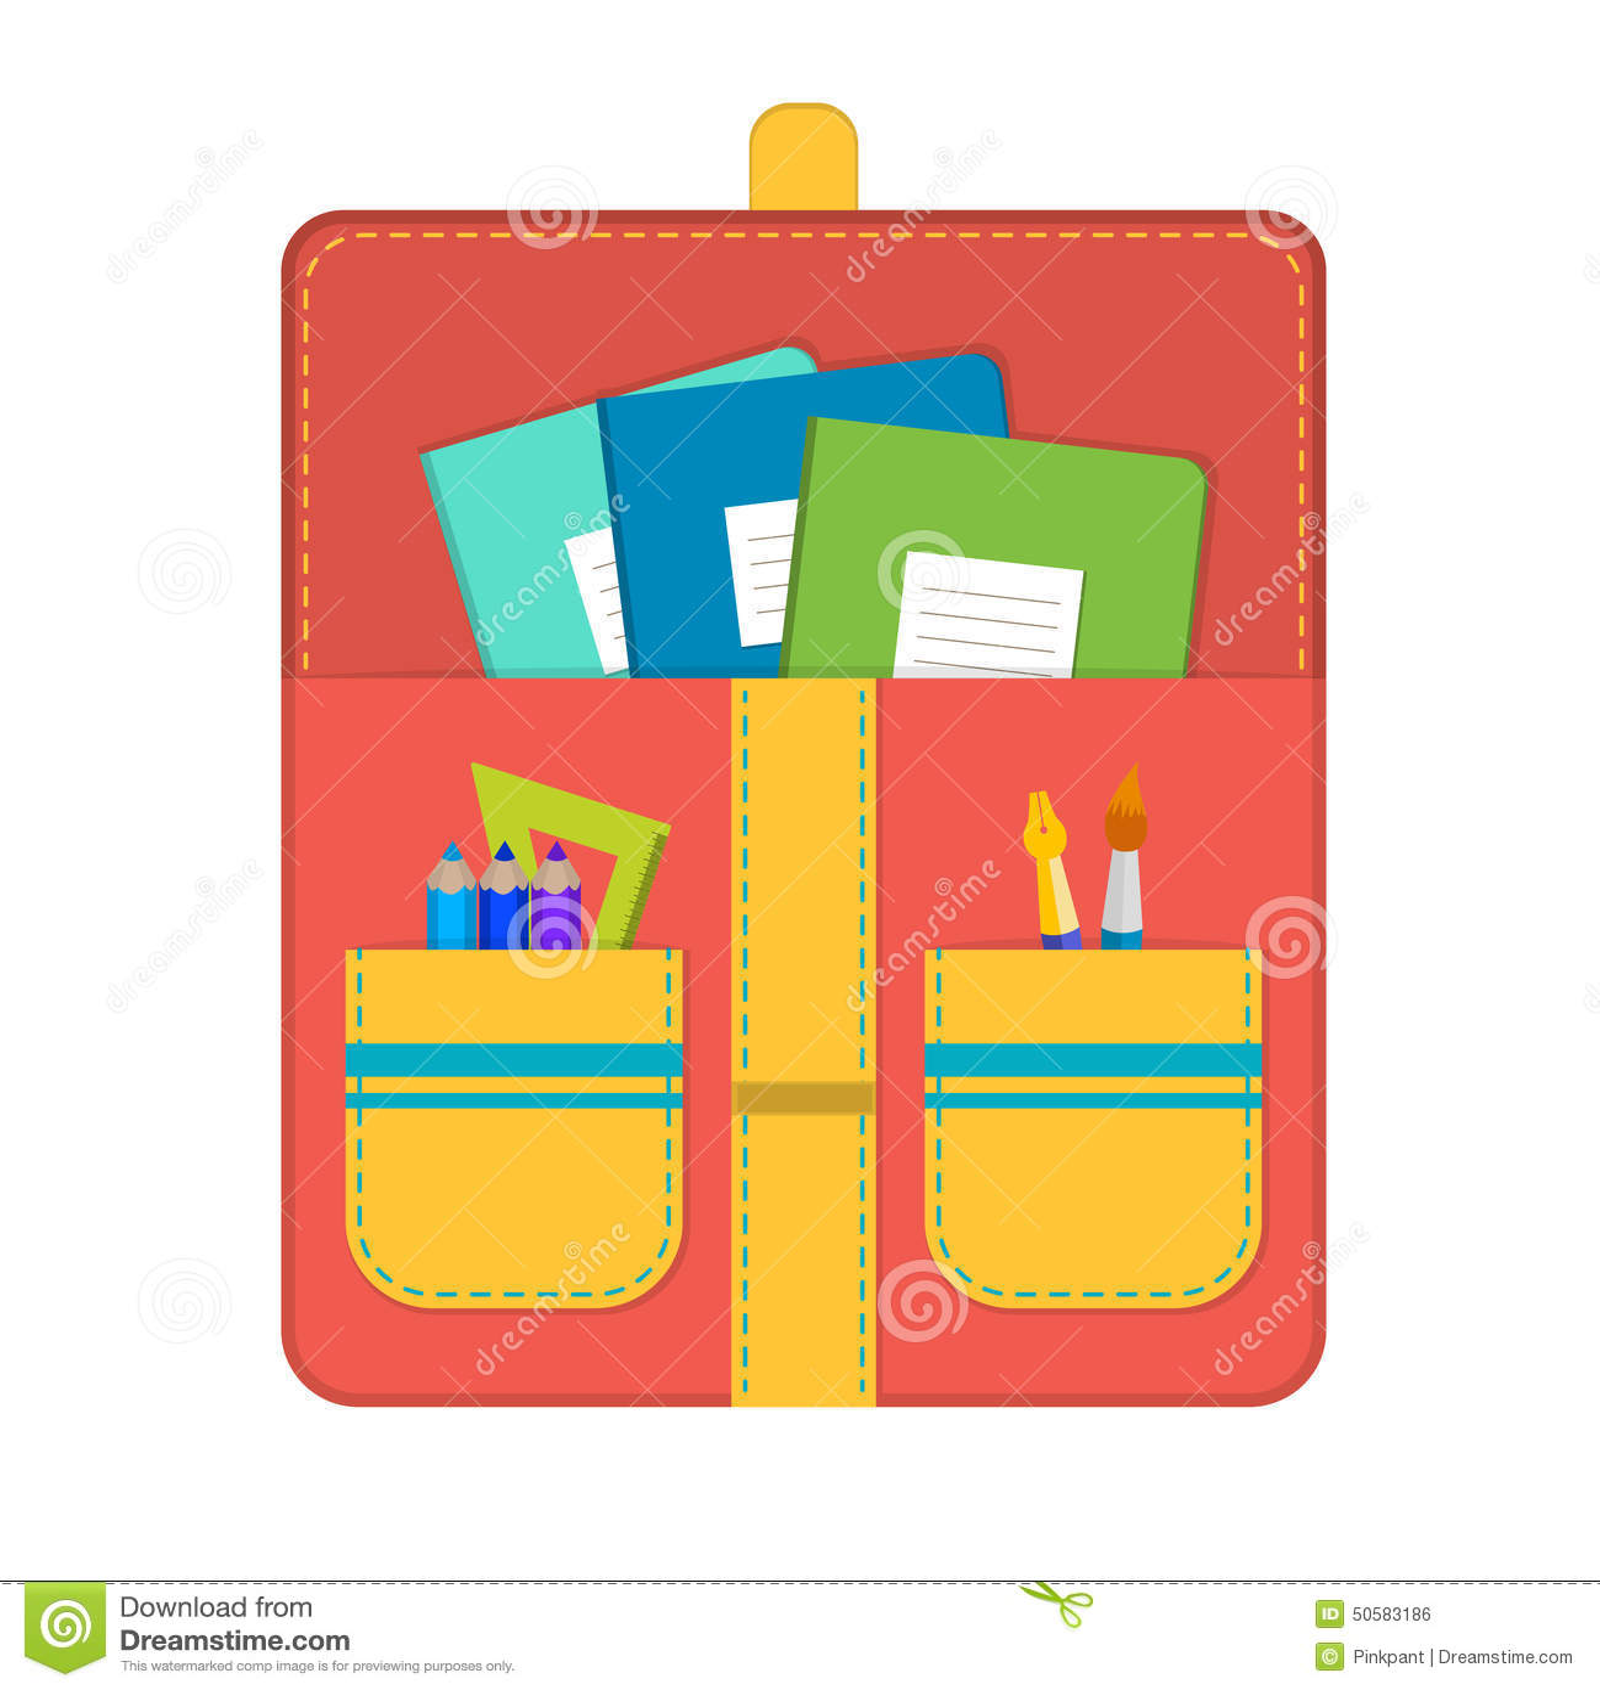 School bag diagram - School Bag With School Supplies